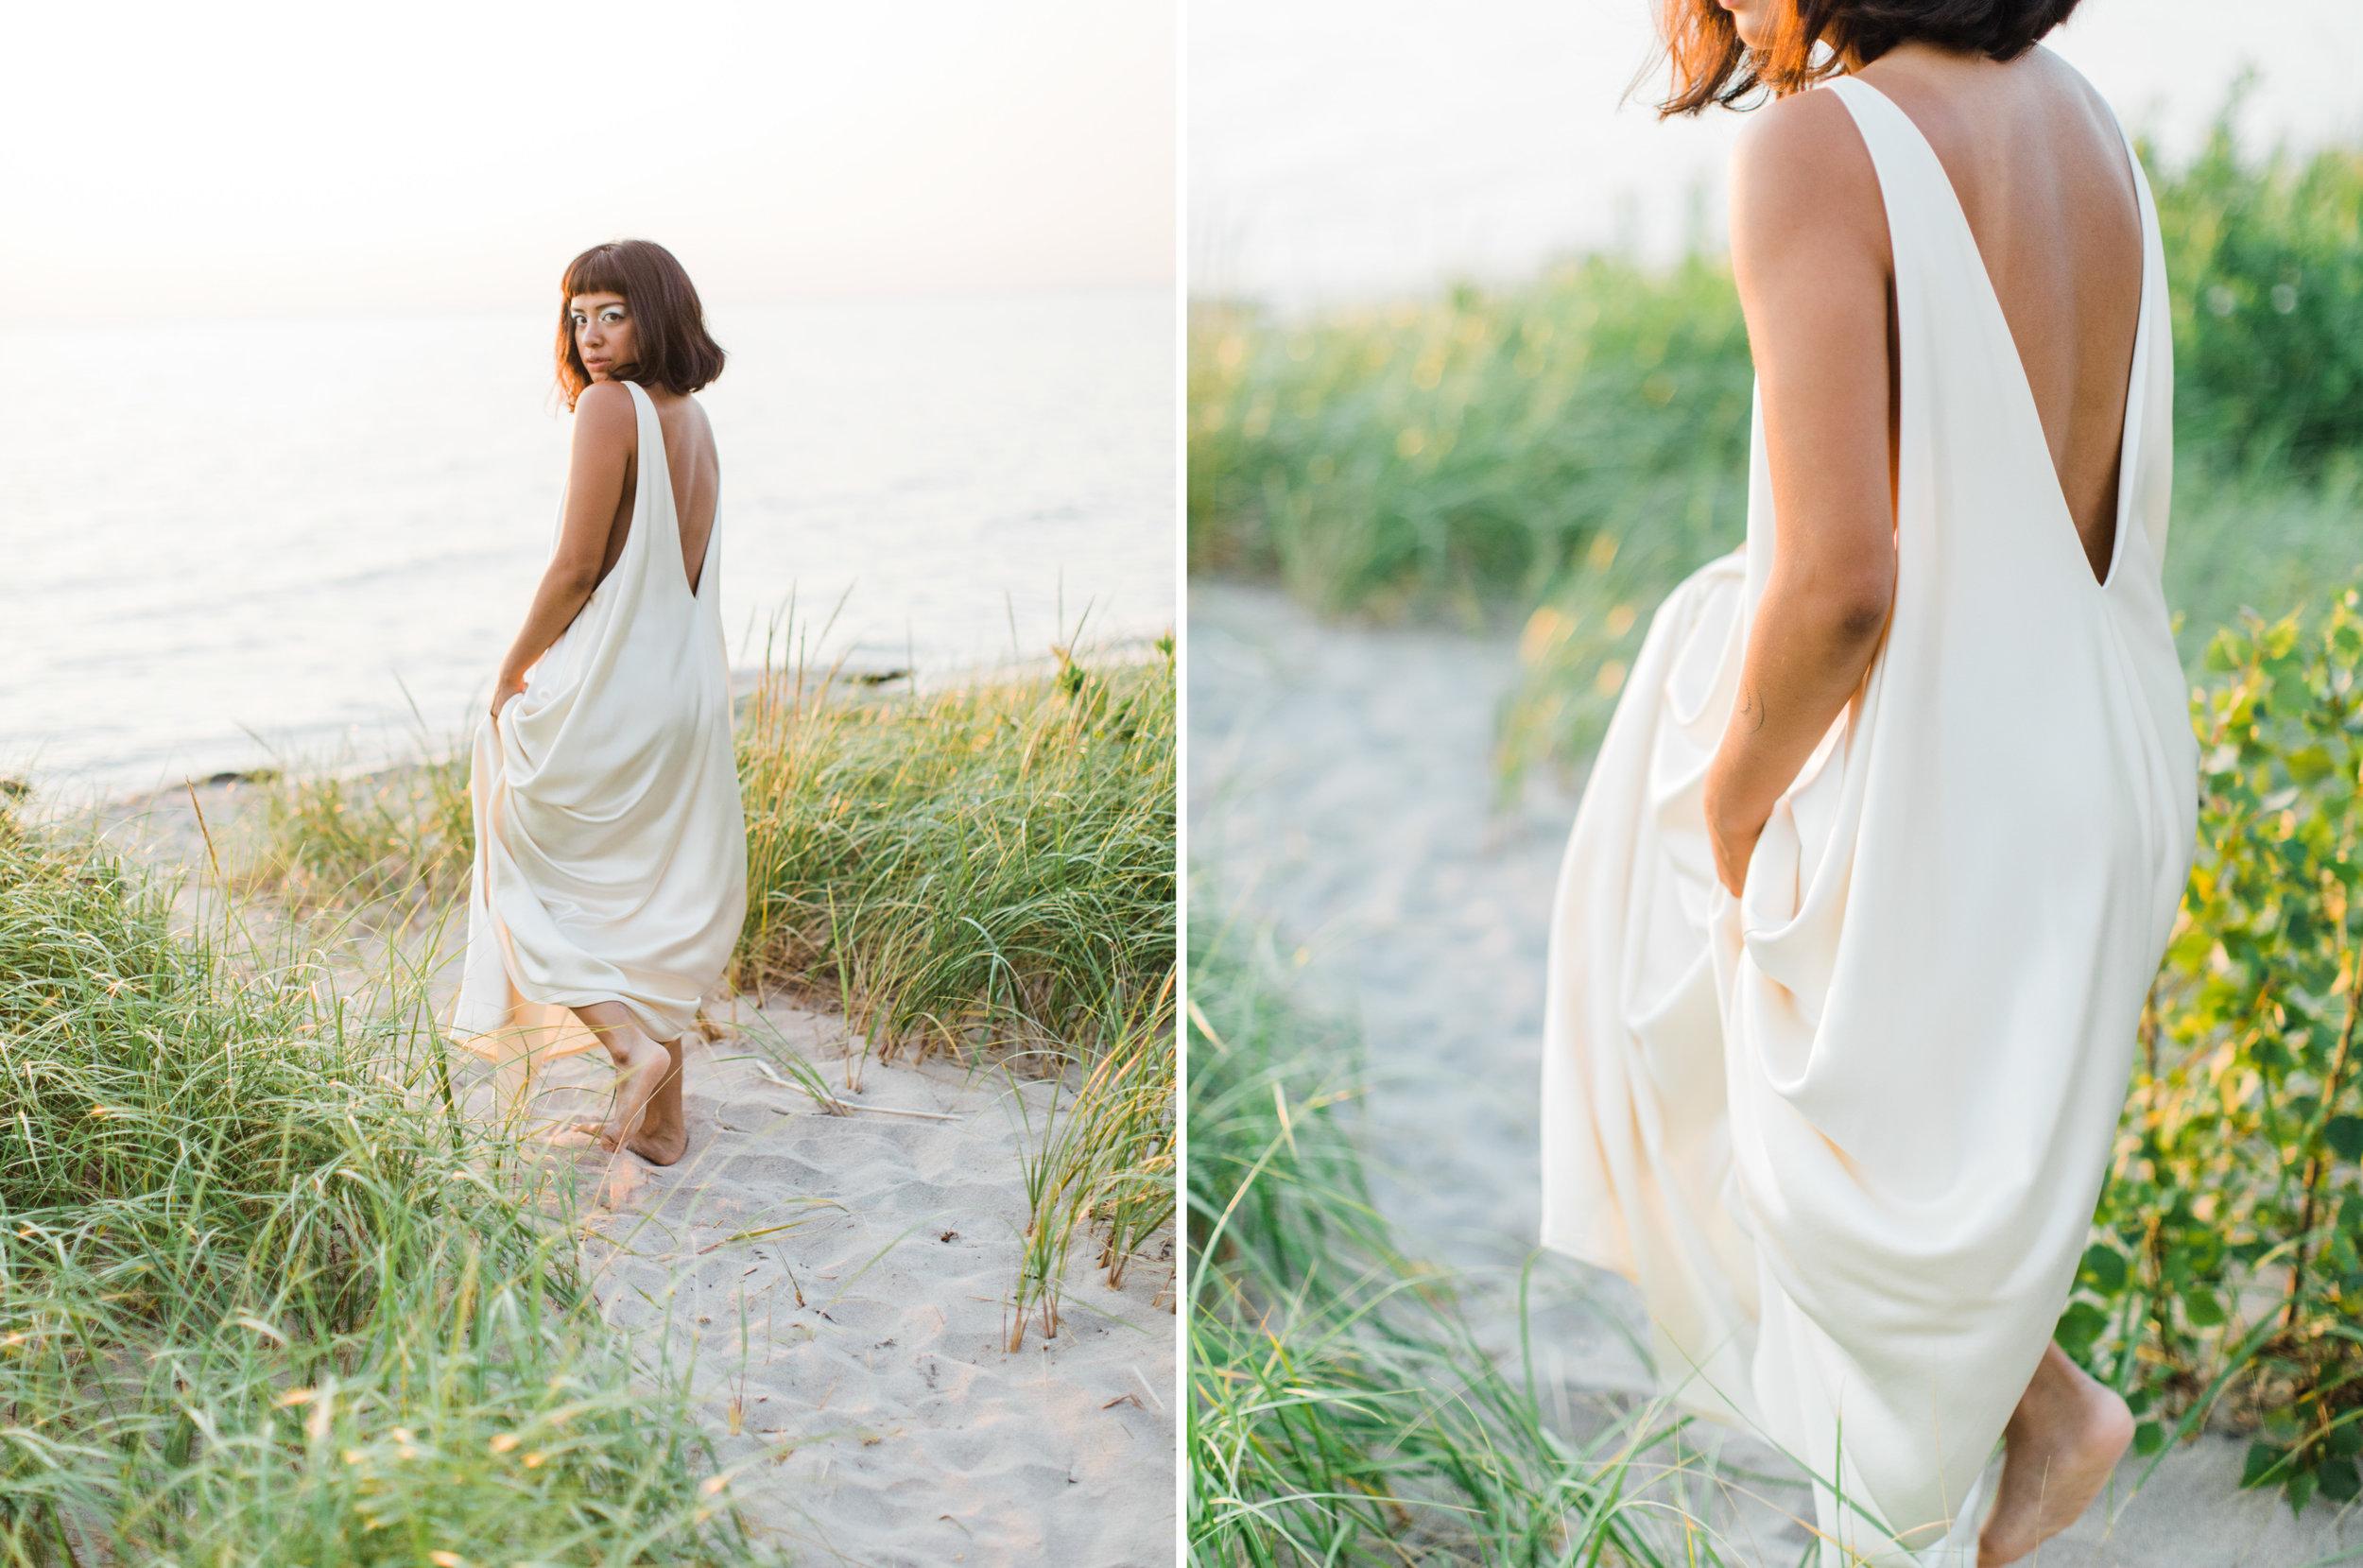 toronto_wedding_photographer_beach_fine_art9.jpg